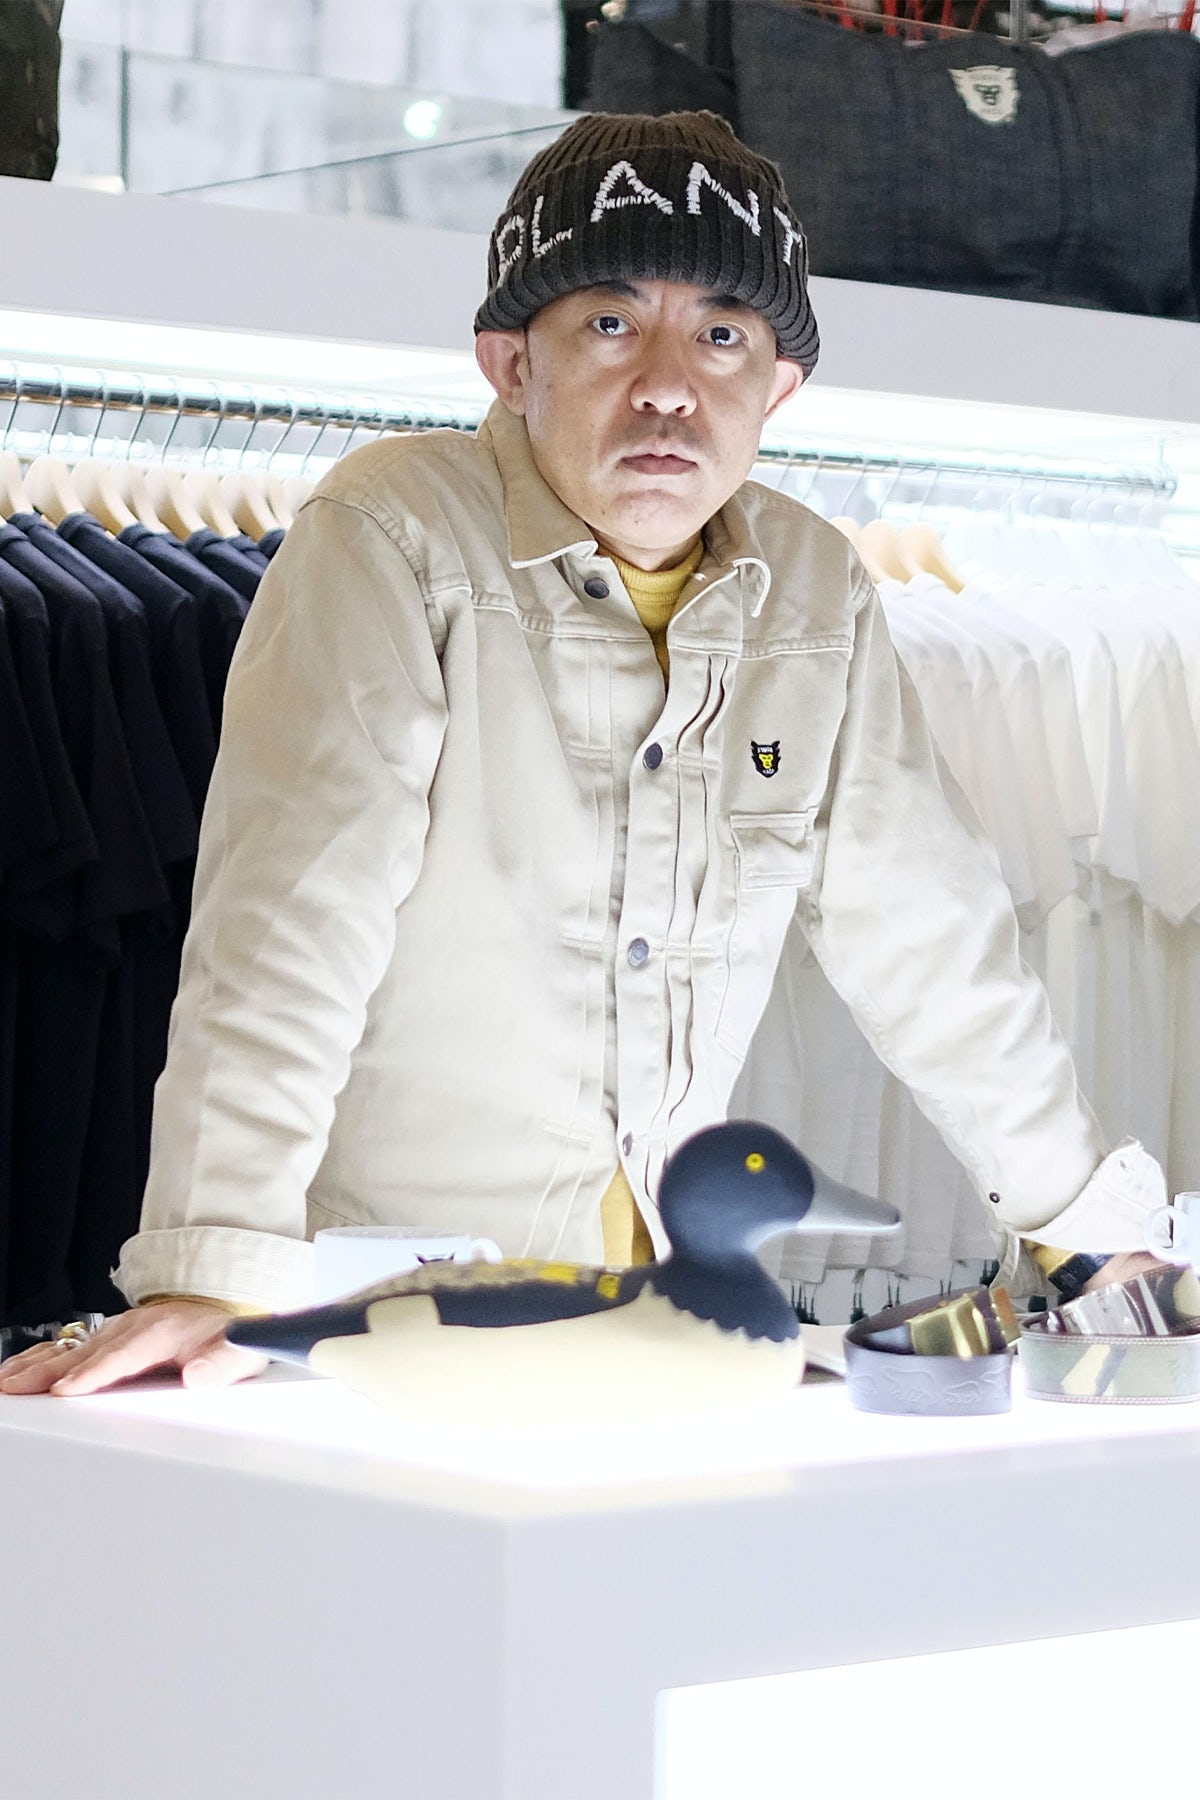 LVMH's Kenzo names Nigo as its new designer. Getty Images.